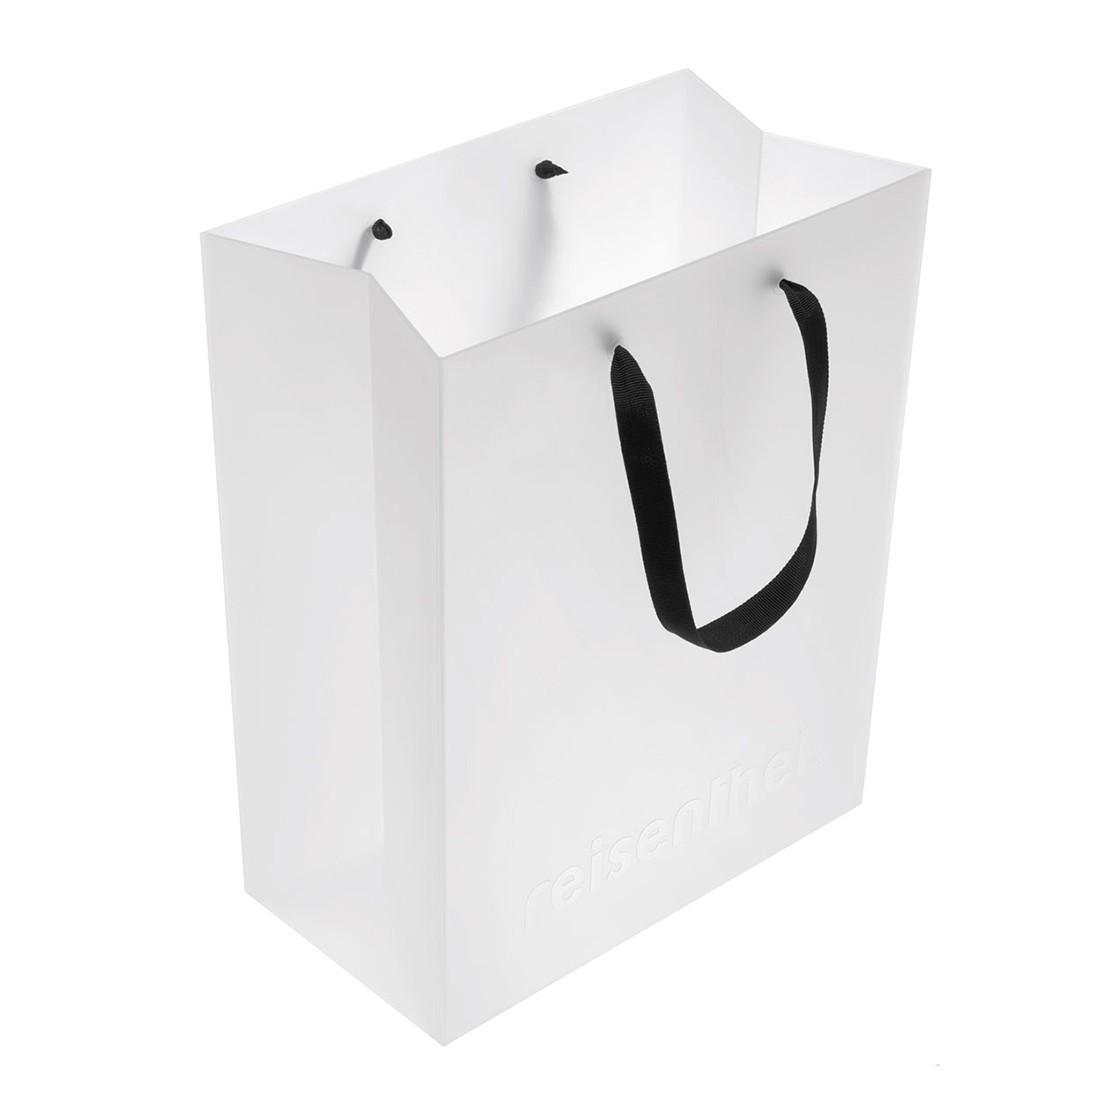 Binbox Papierkorb Milky – Polypropylen Milky, Reisenthel Accessoires kaufen